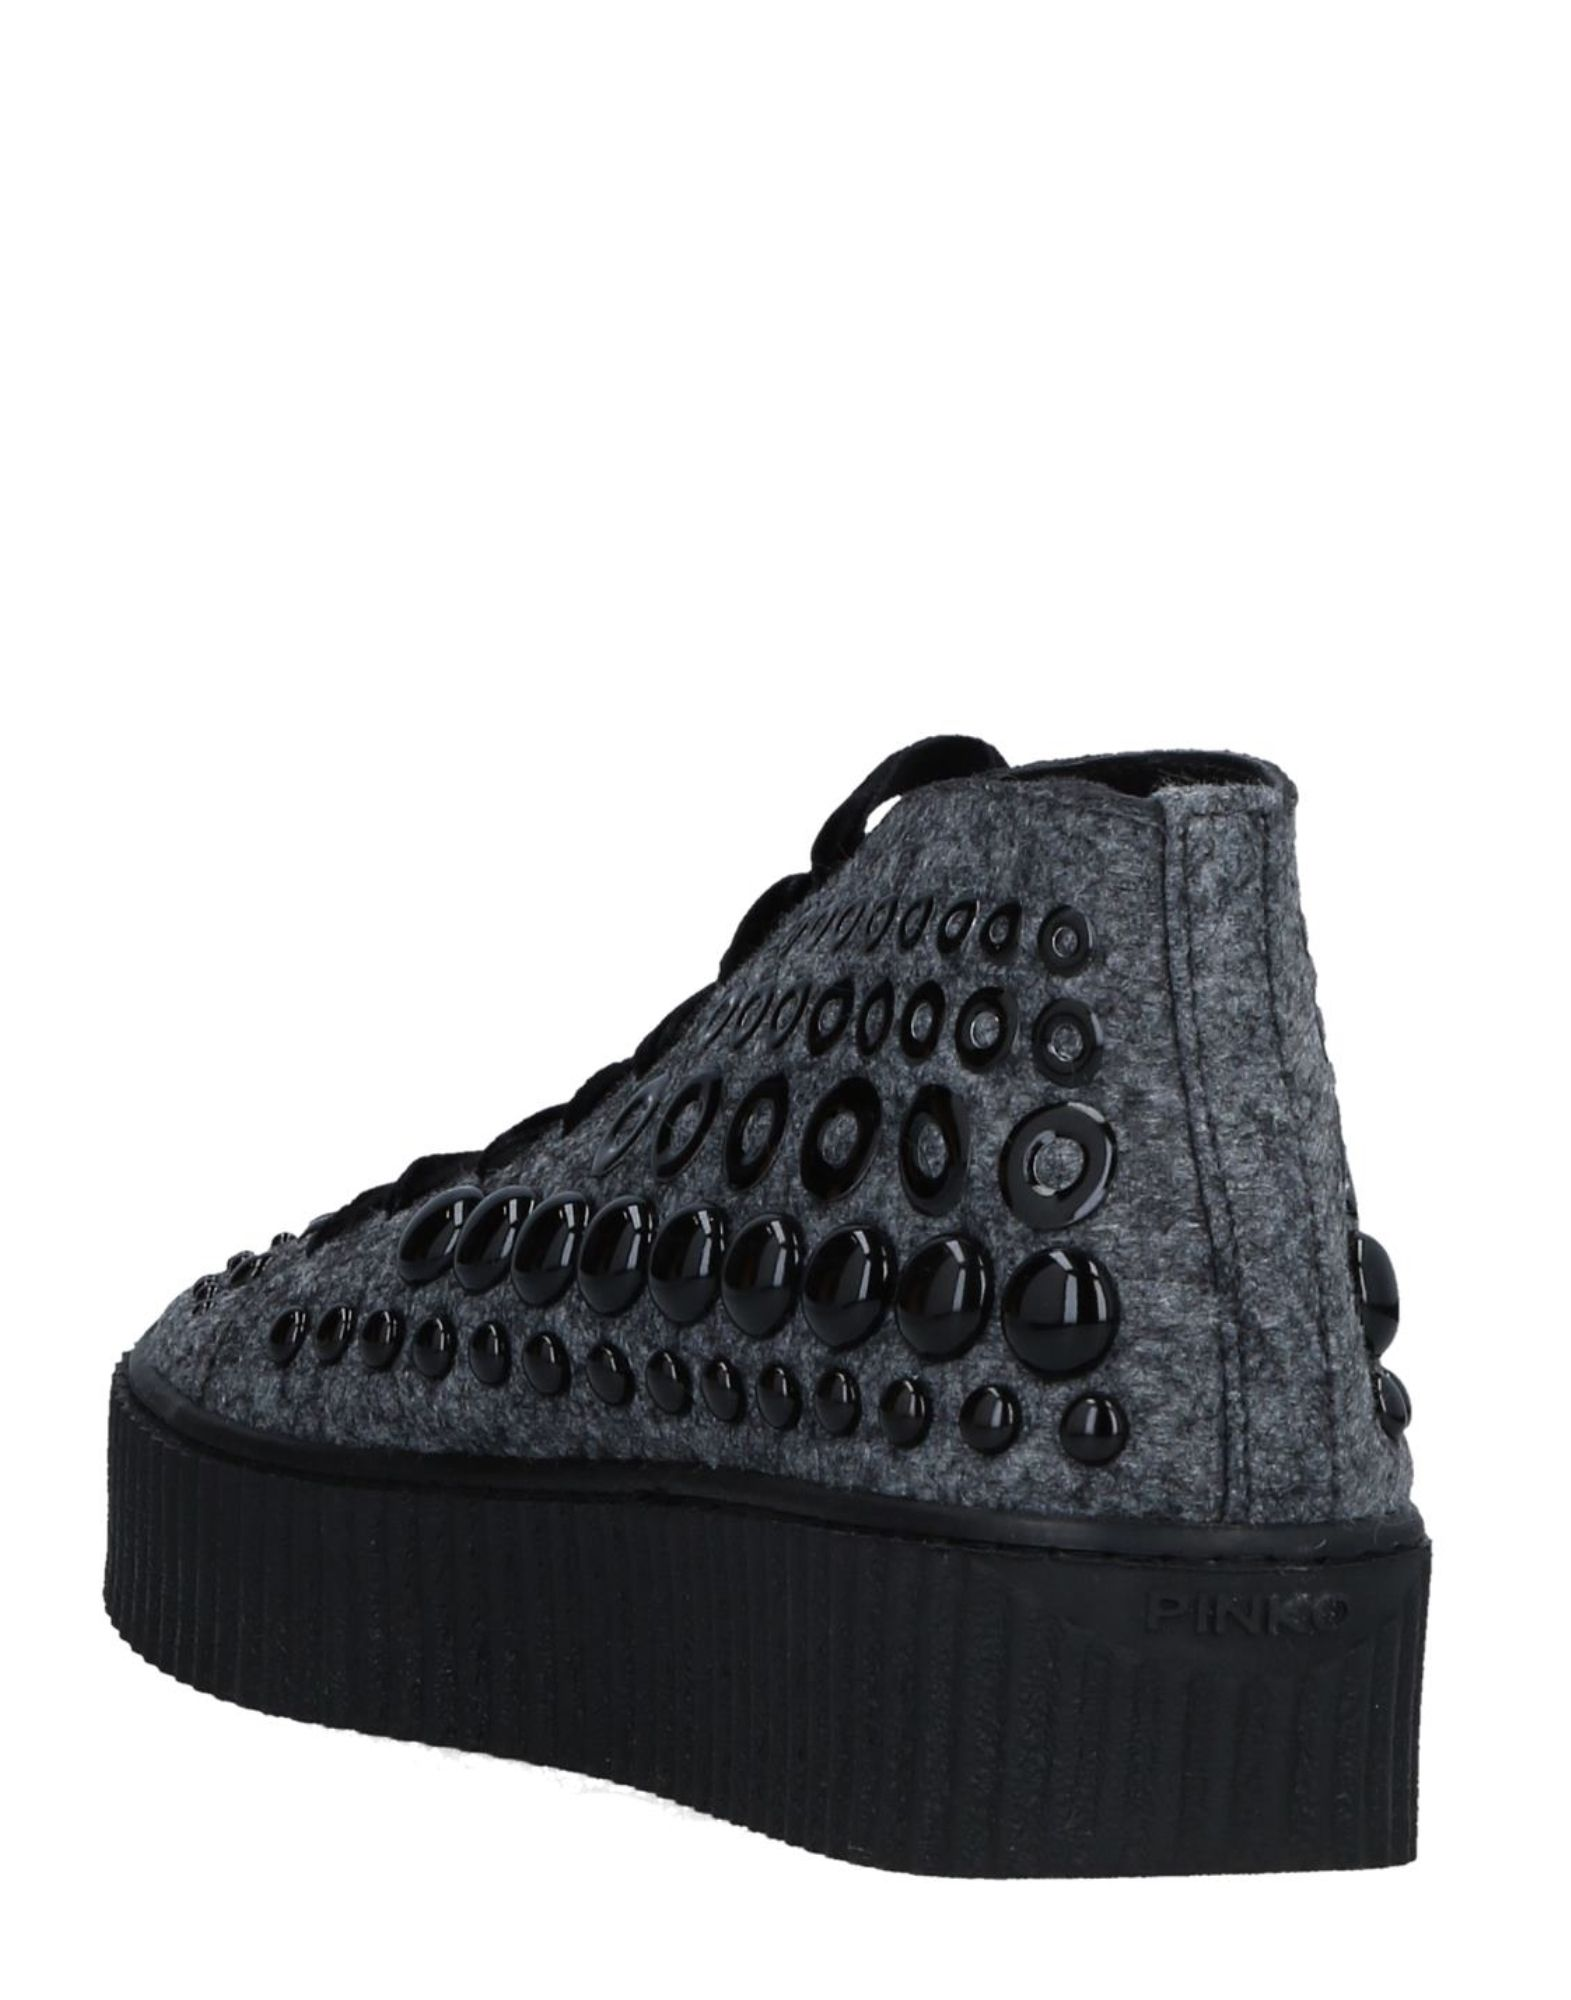 Stilvolle billige Sneakers Schuhe Pinko Sneakers billige Damen  11514874EX 0d8677